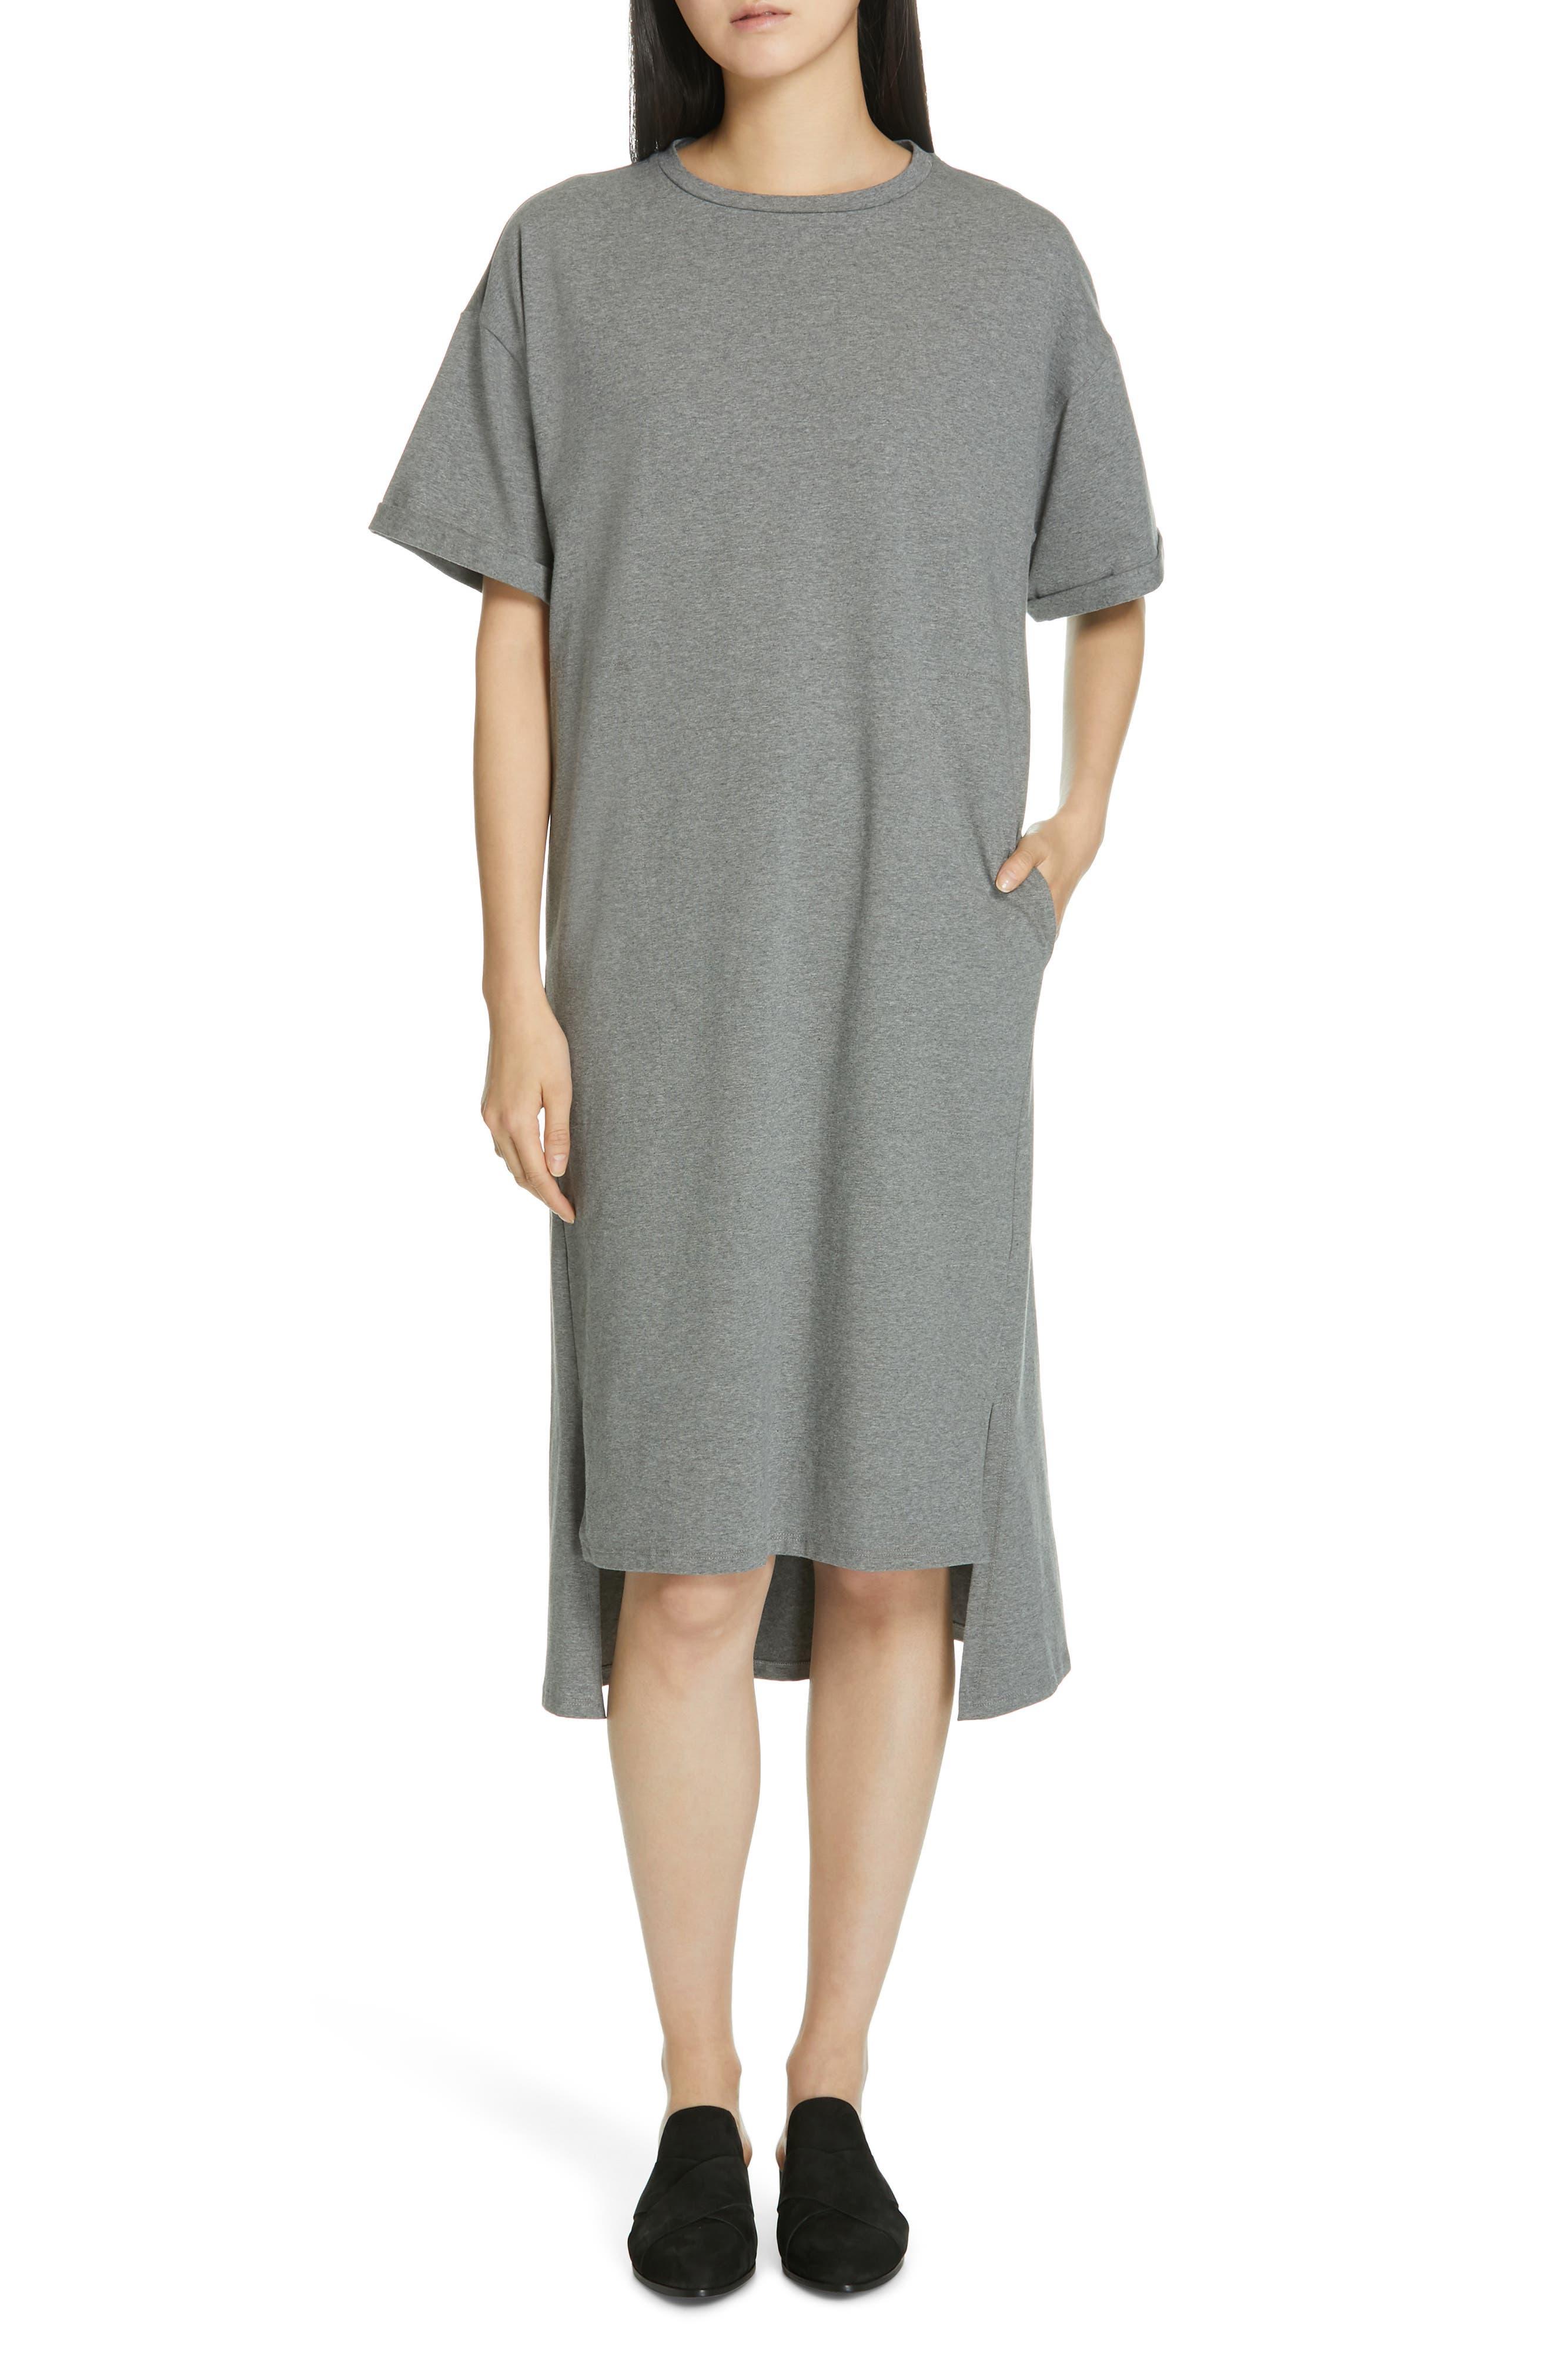 Petite Eileen Fisher Organic Cotton T-Shirt Dress, Grey